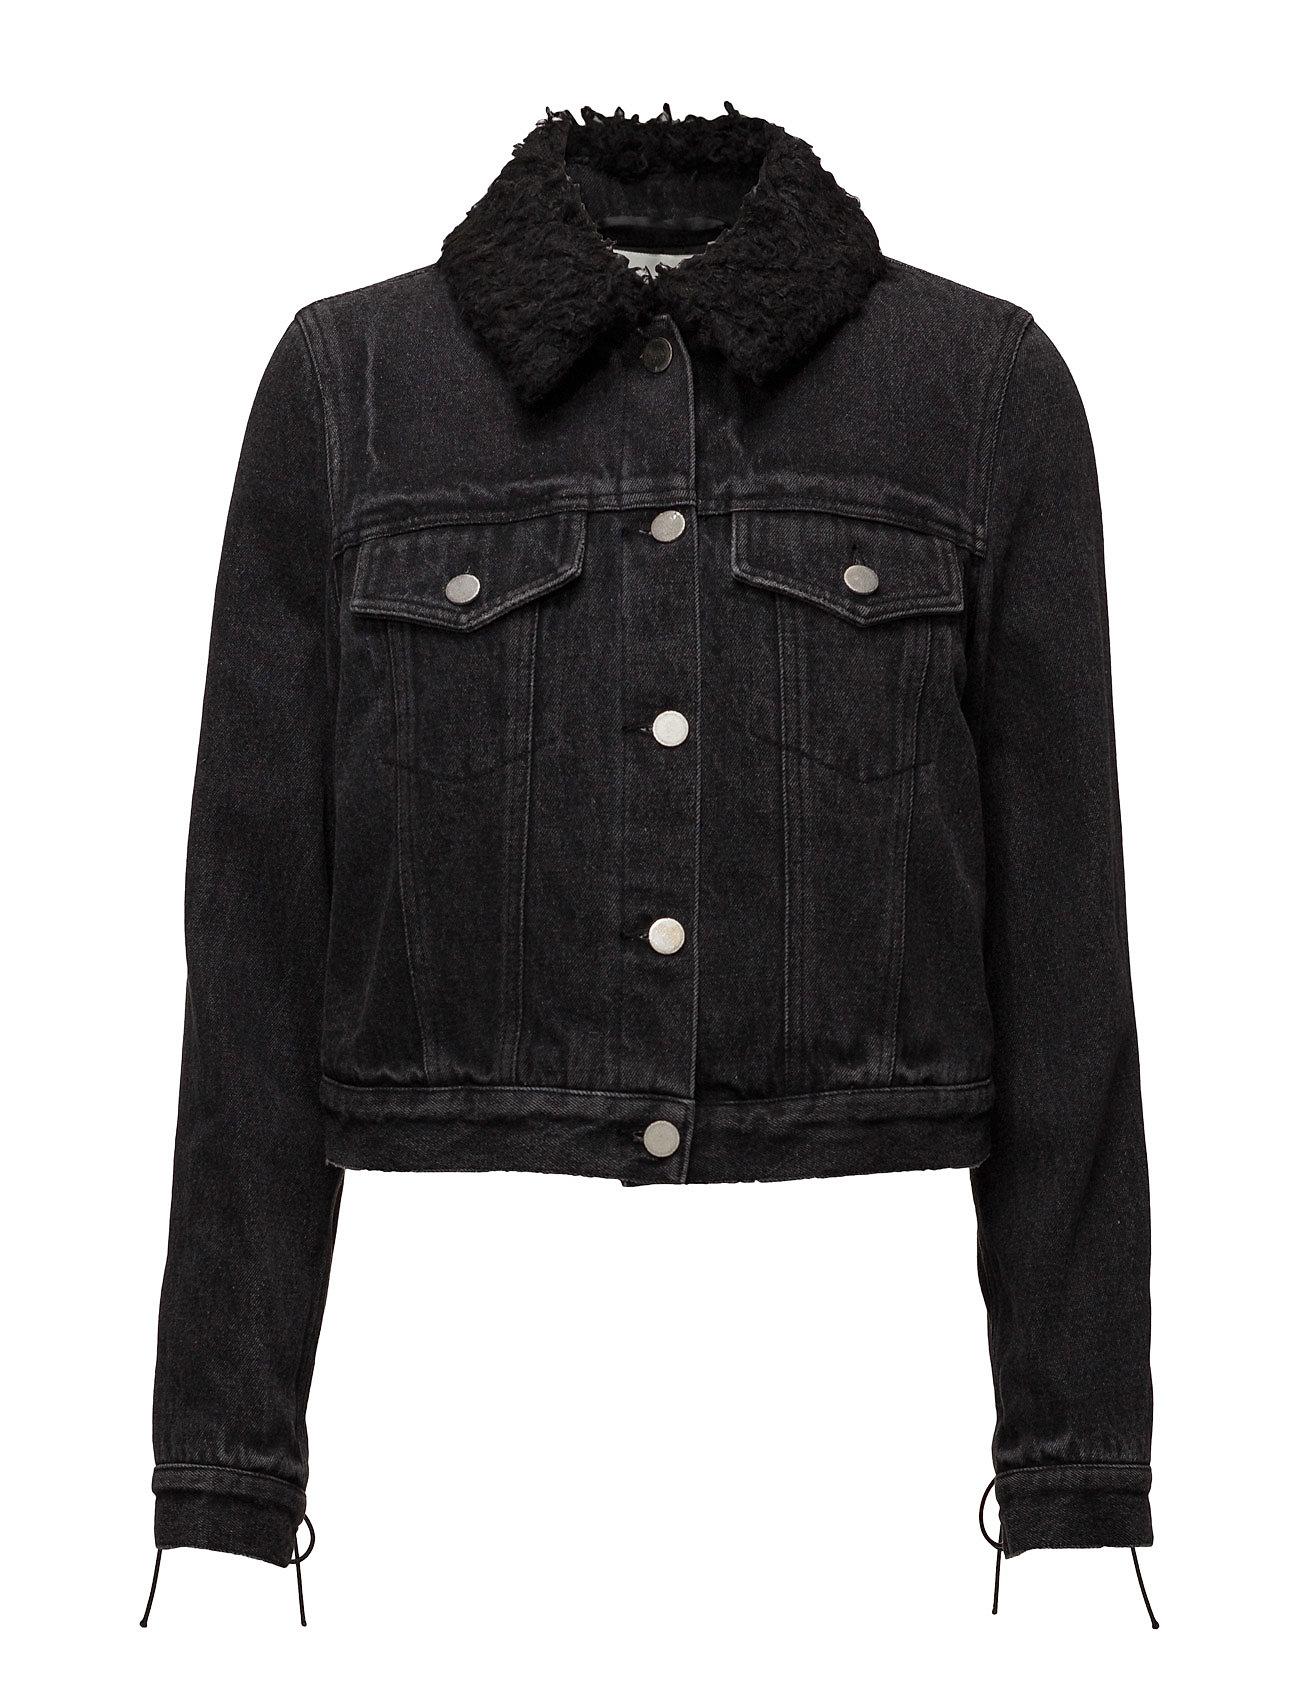 Denim jacket w sherpa collar fra 3.1 phillip lim på boozt.com dk